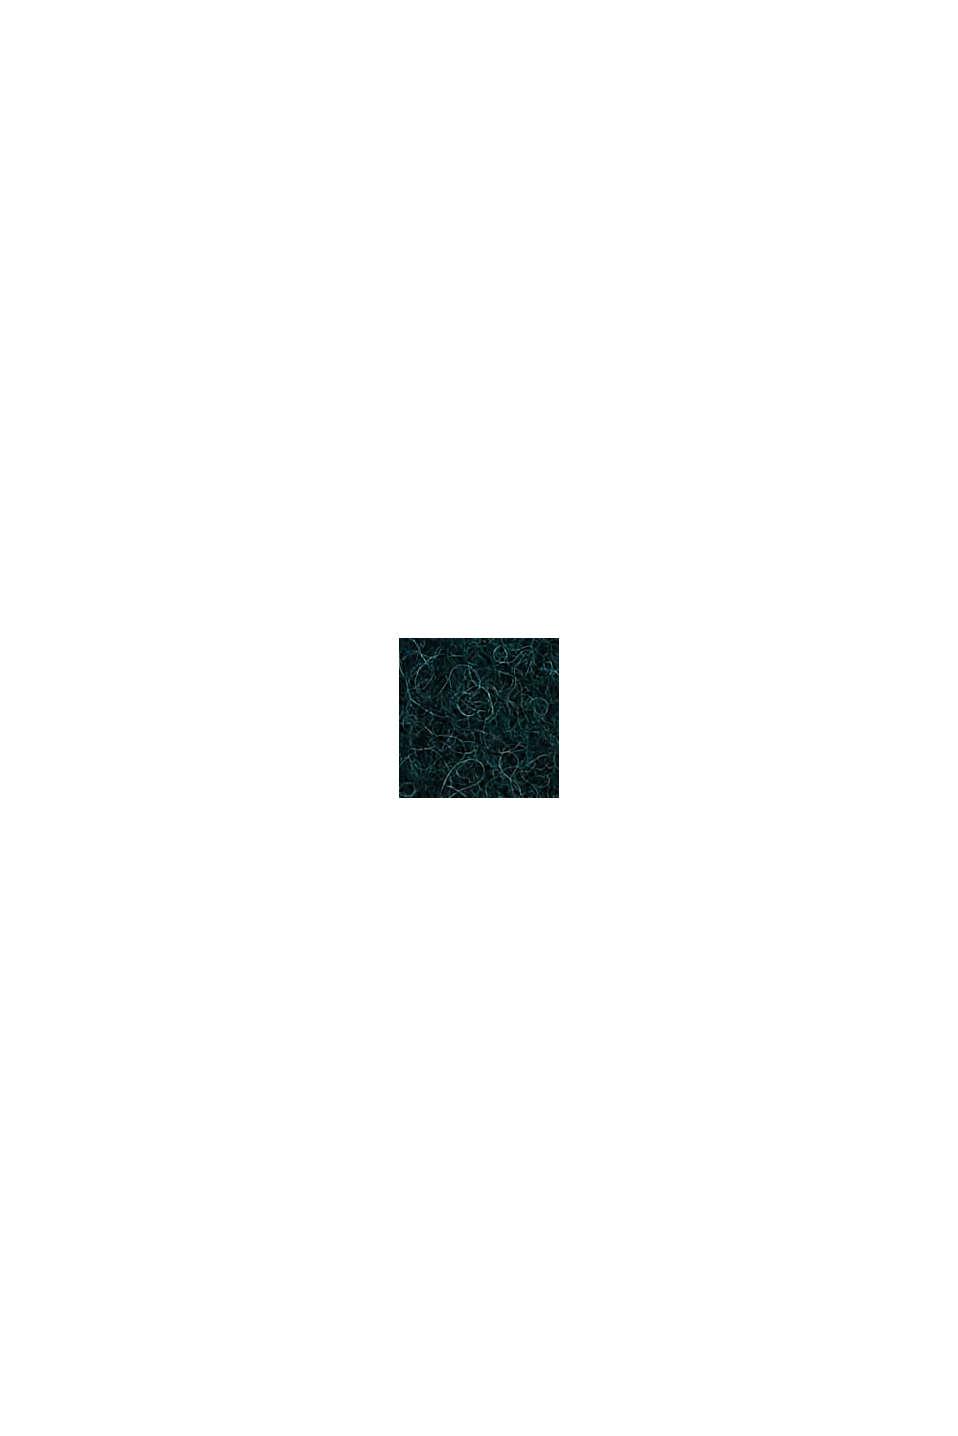 Rib knit beanie in a wool/alpaca blend, DARK TEAL GREEN, swatch